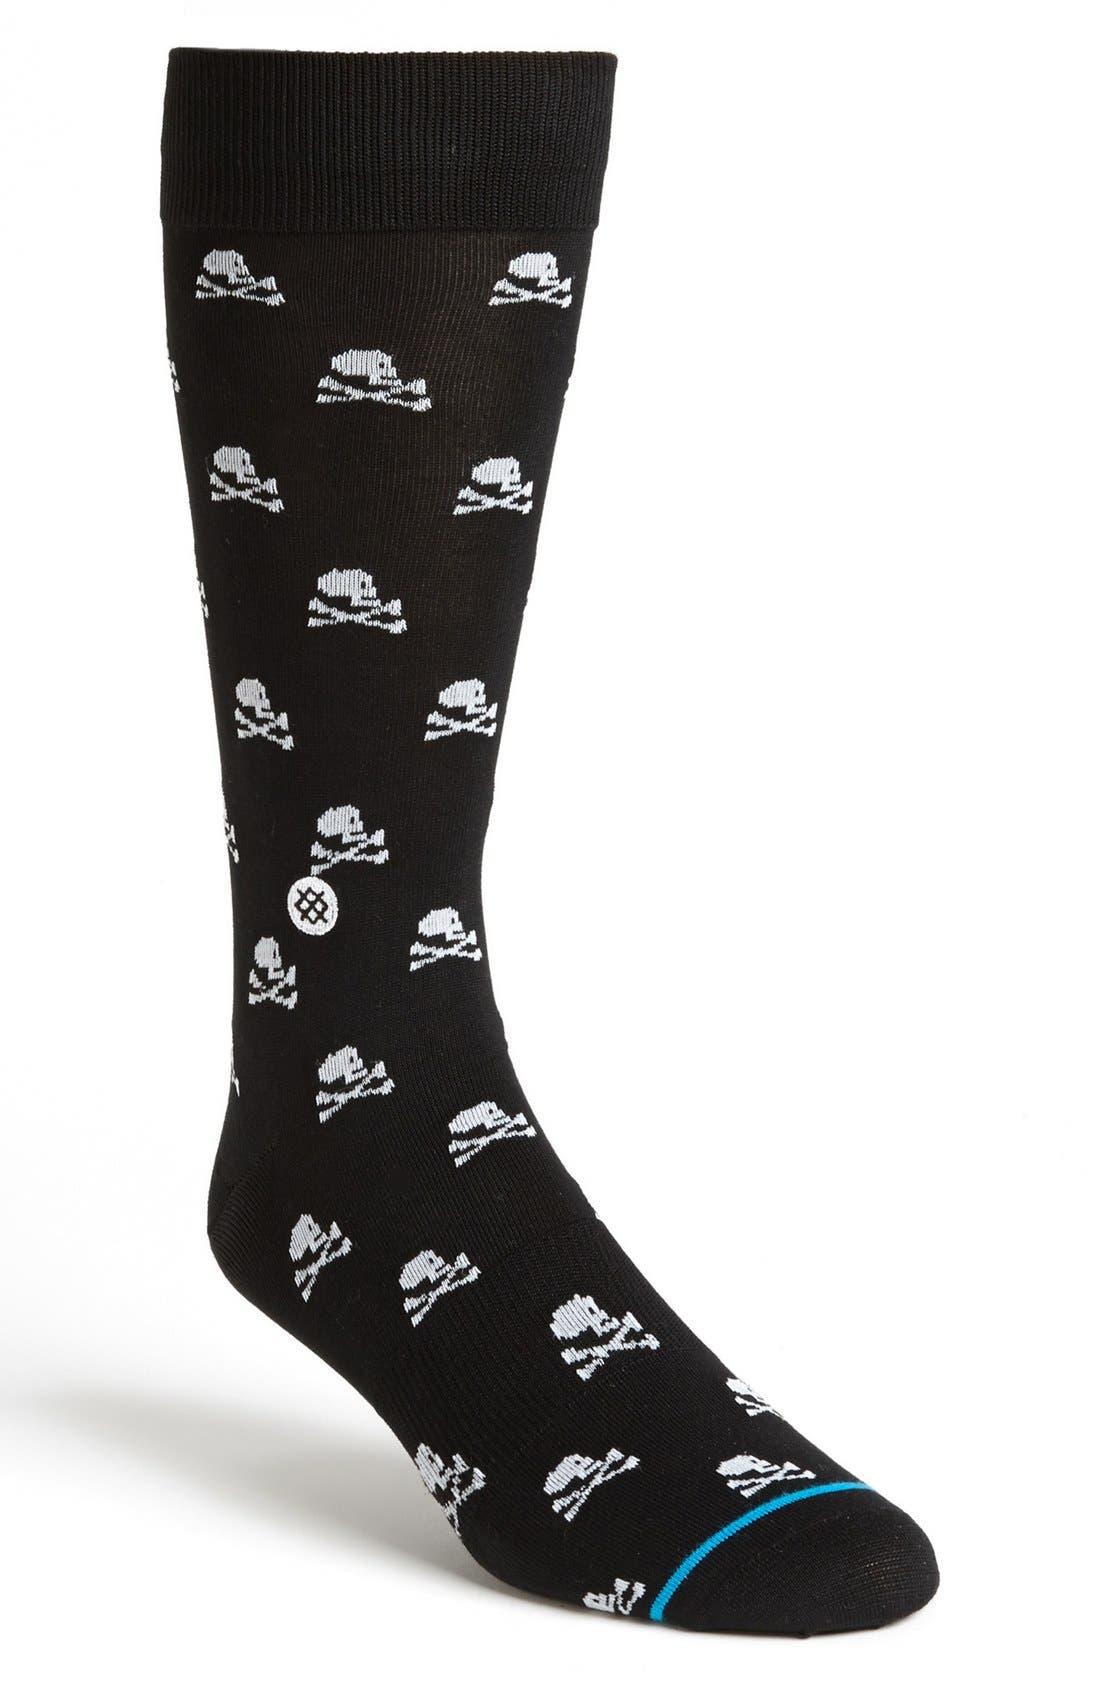 Main Image - Stance 'Bullingdon' Dress Socks